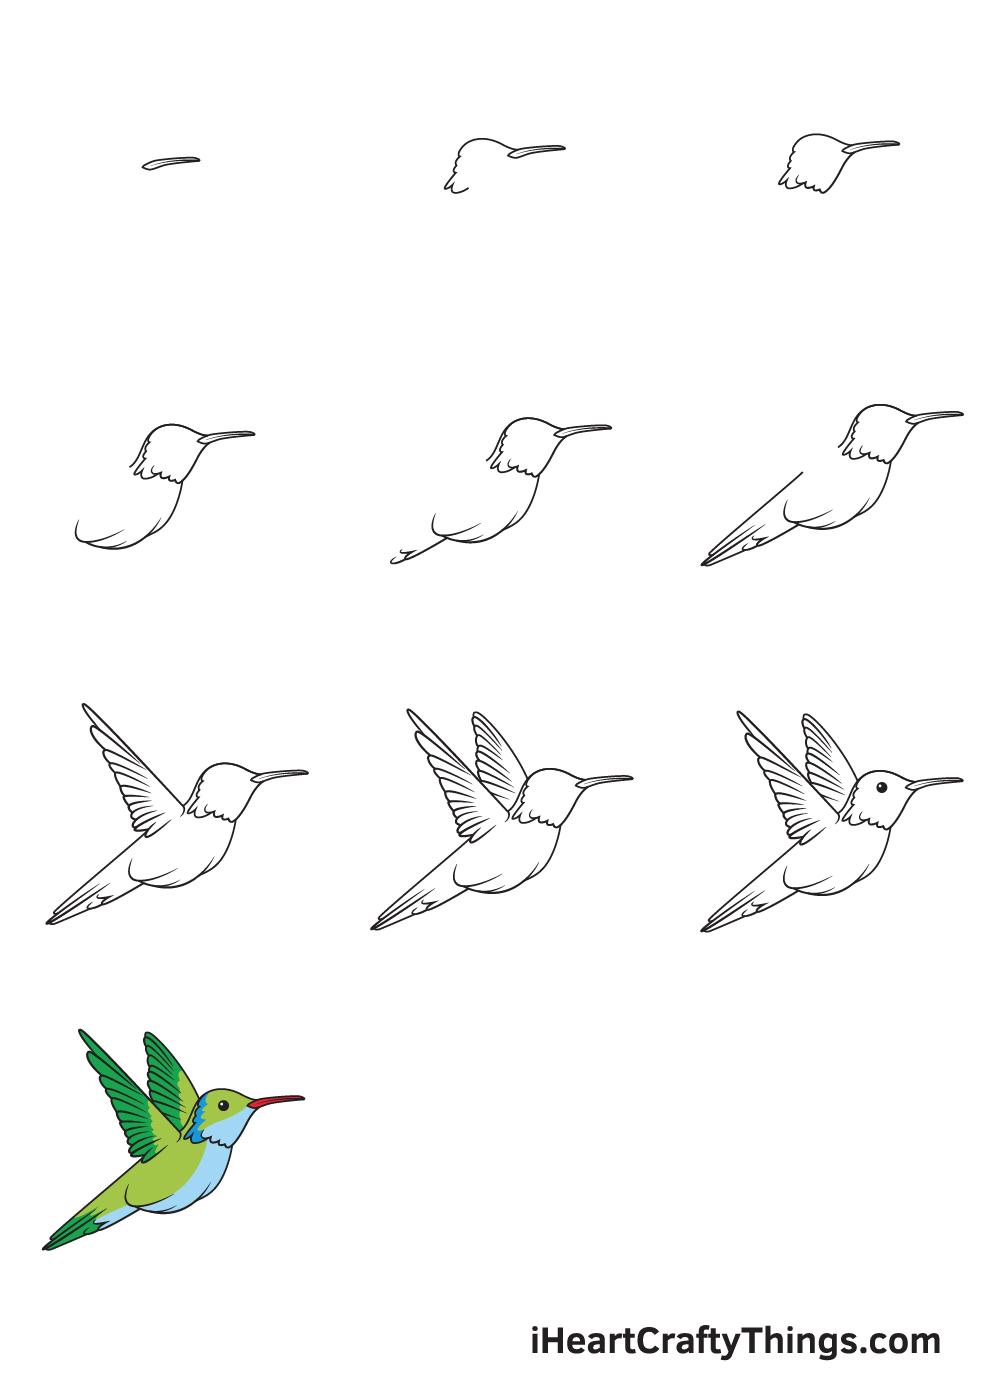 drawing hummingbird in 9 steps